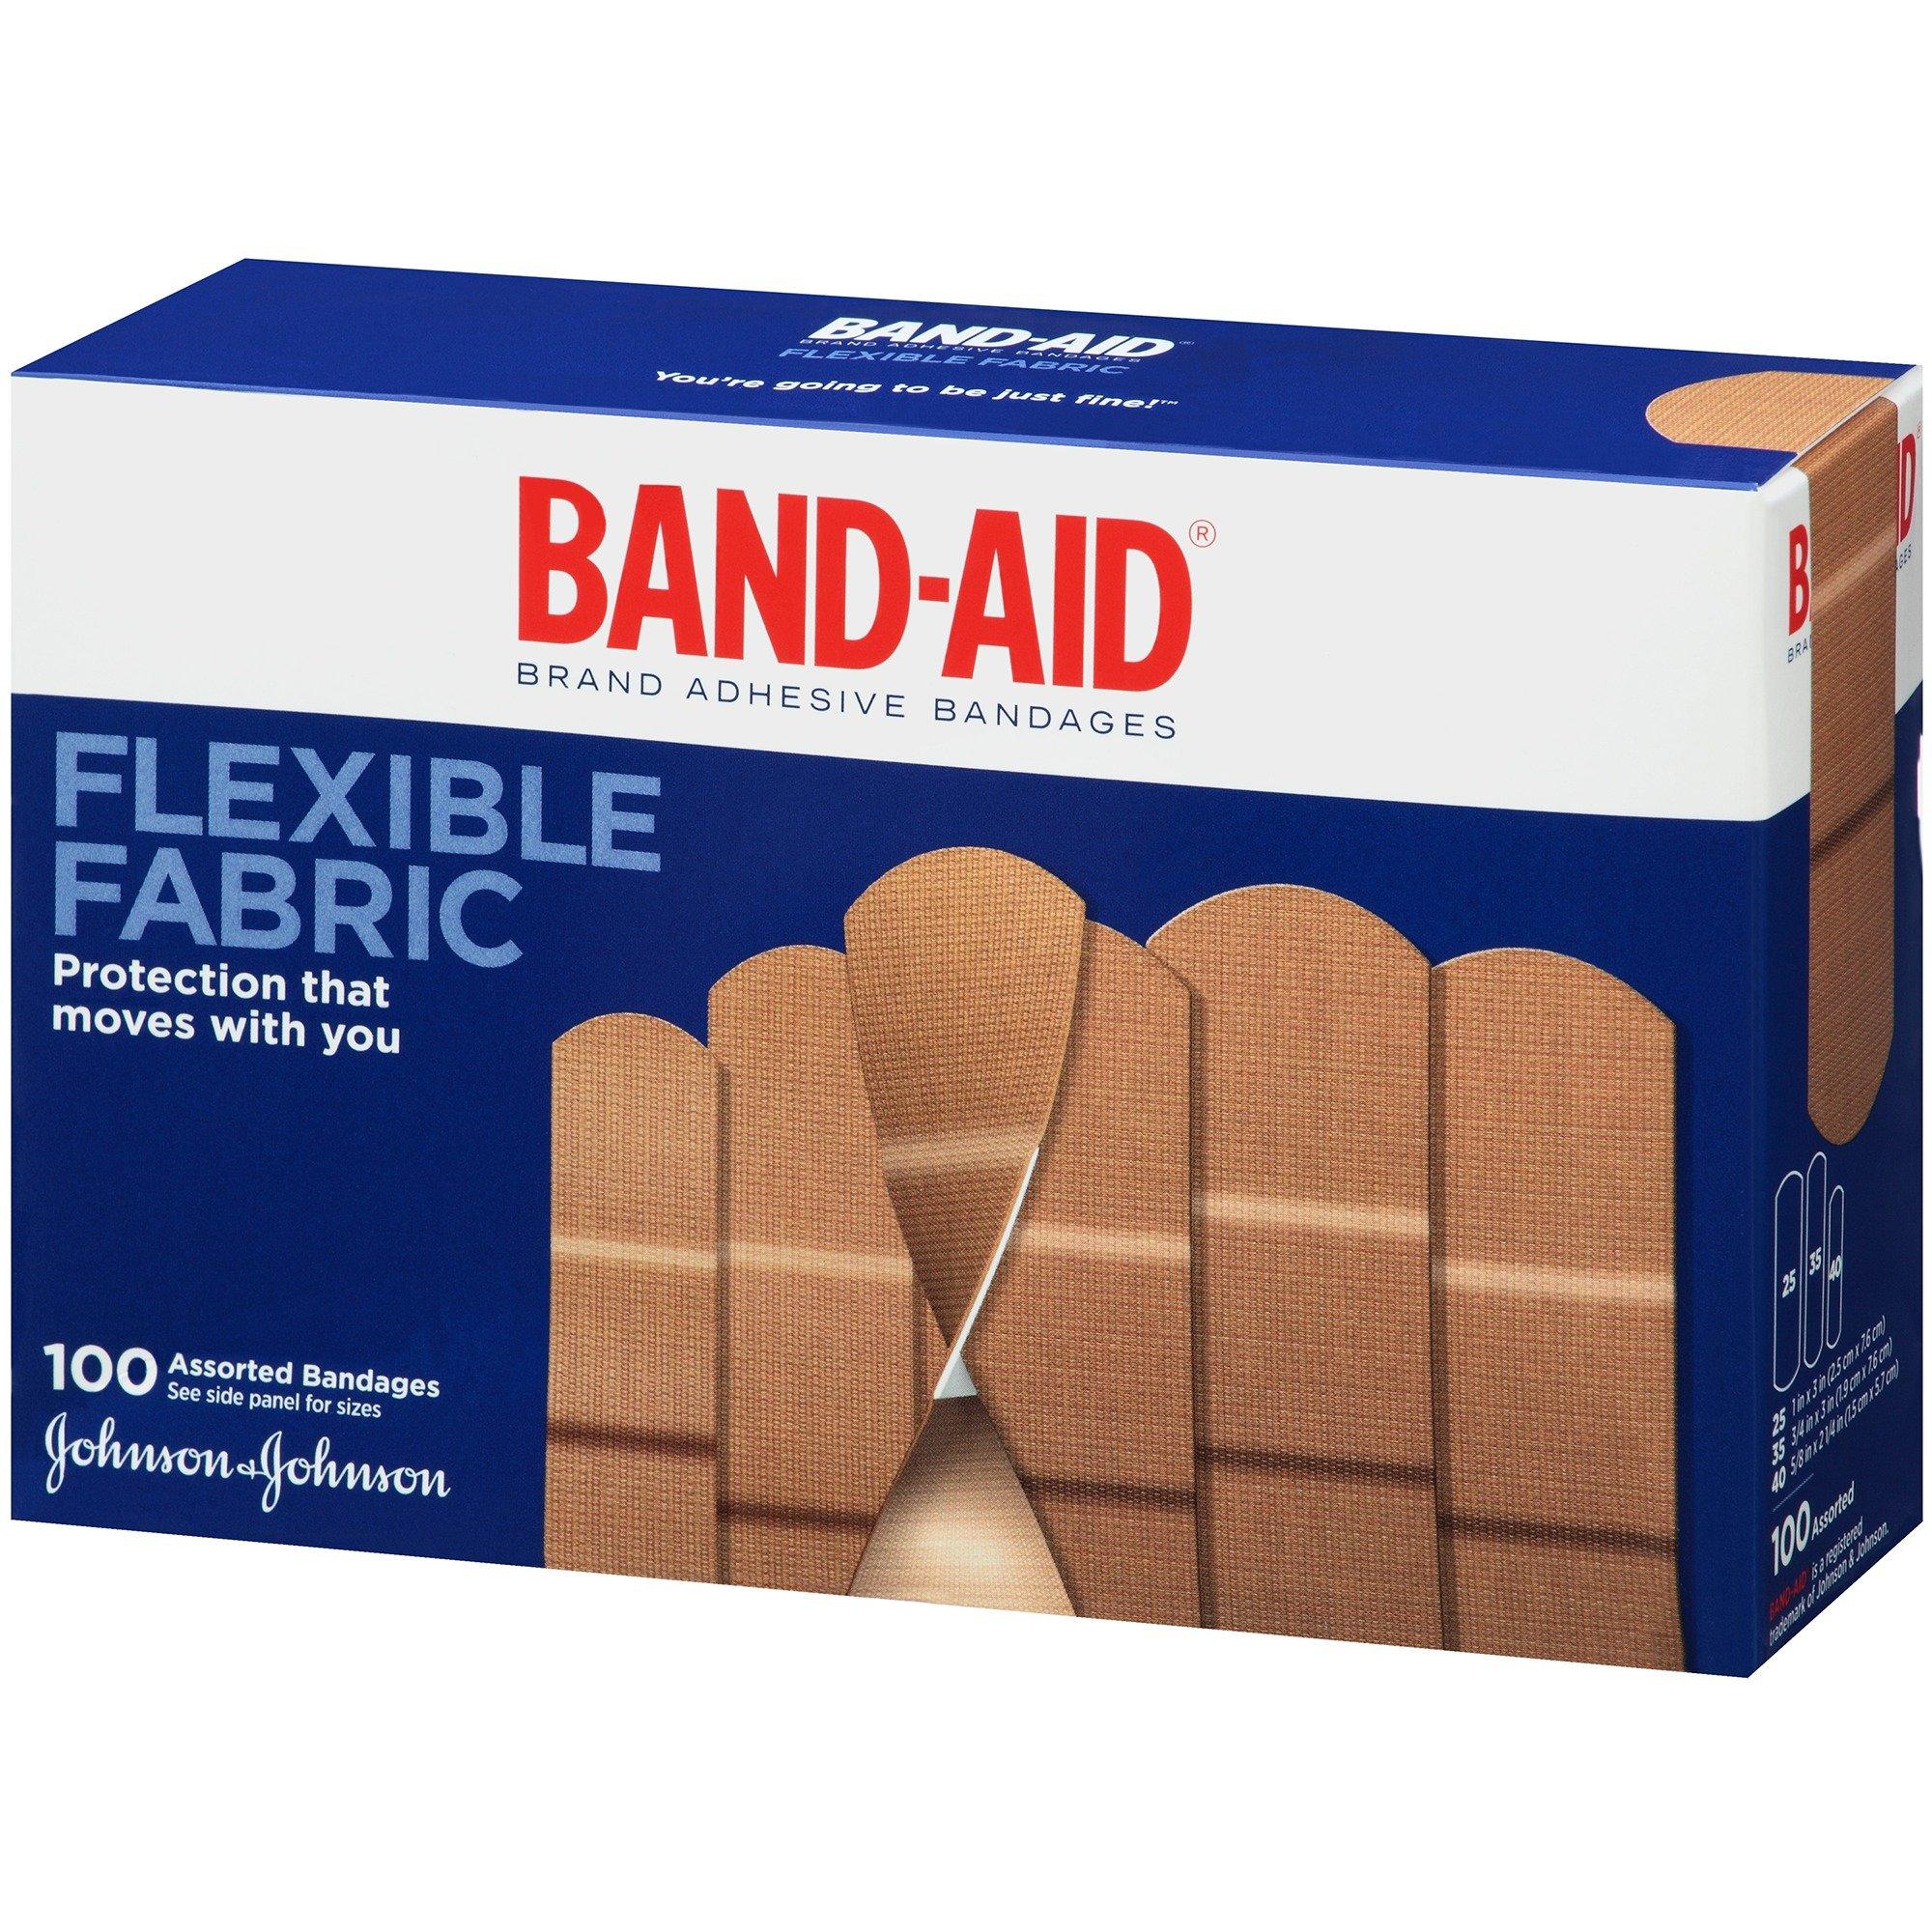 Band-Aid Brand Flexible Fabric Adhesive